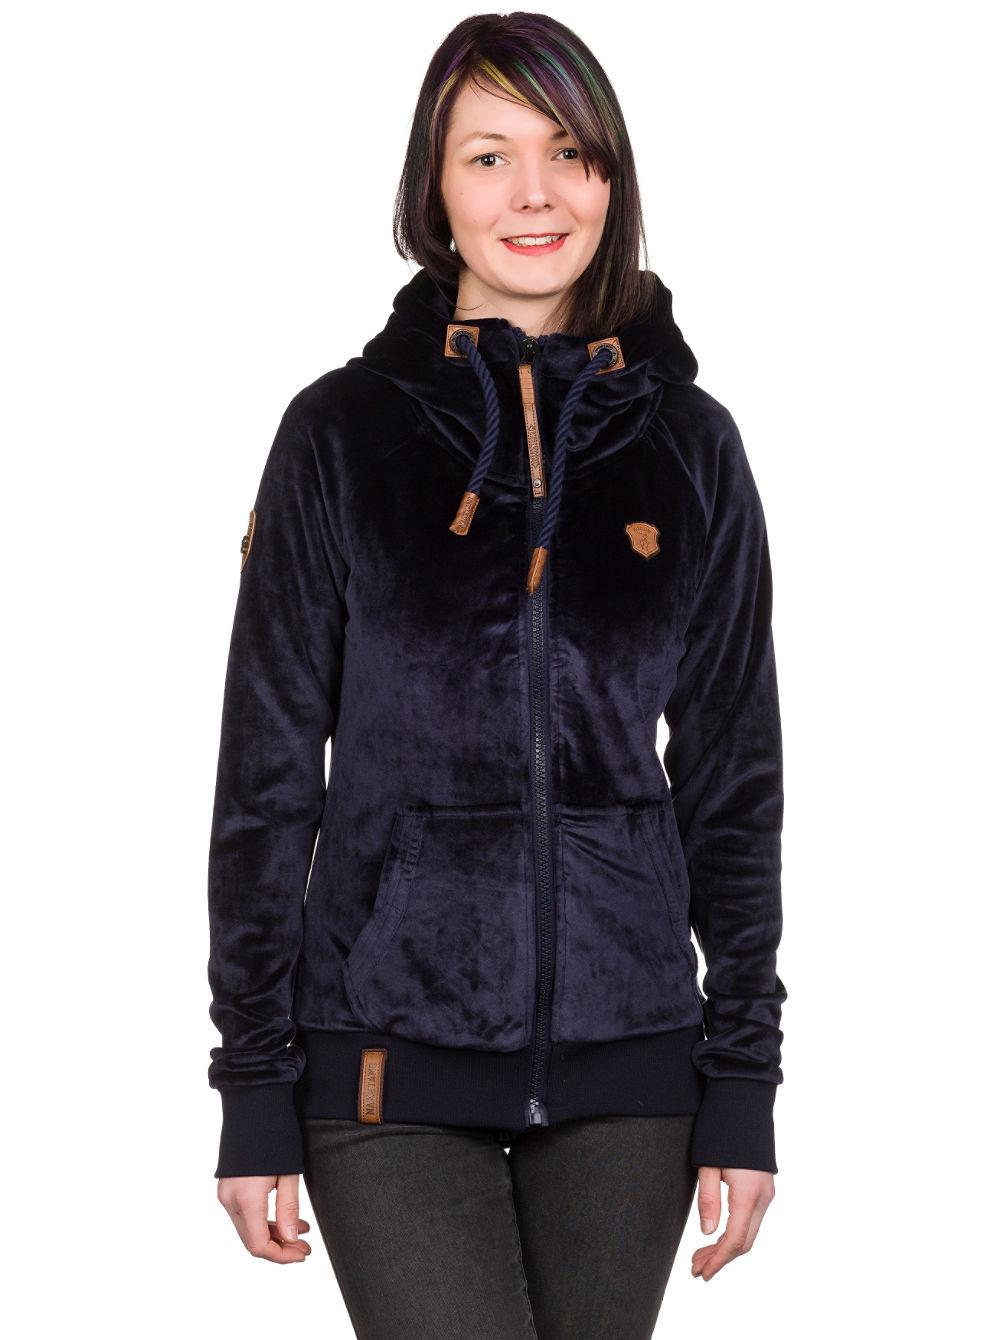 buy naketano brazzo mack zip hoodie online at blue. Black Bedroom Furniture Sets. Home Design Ideas